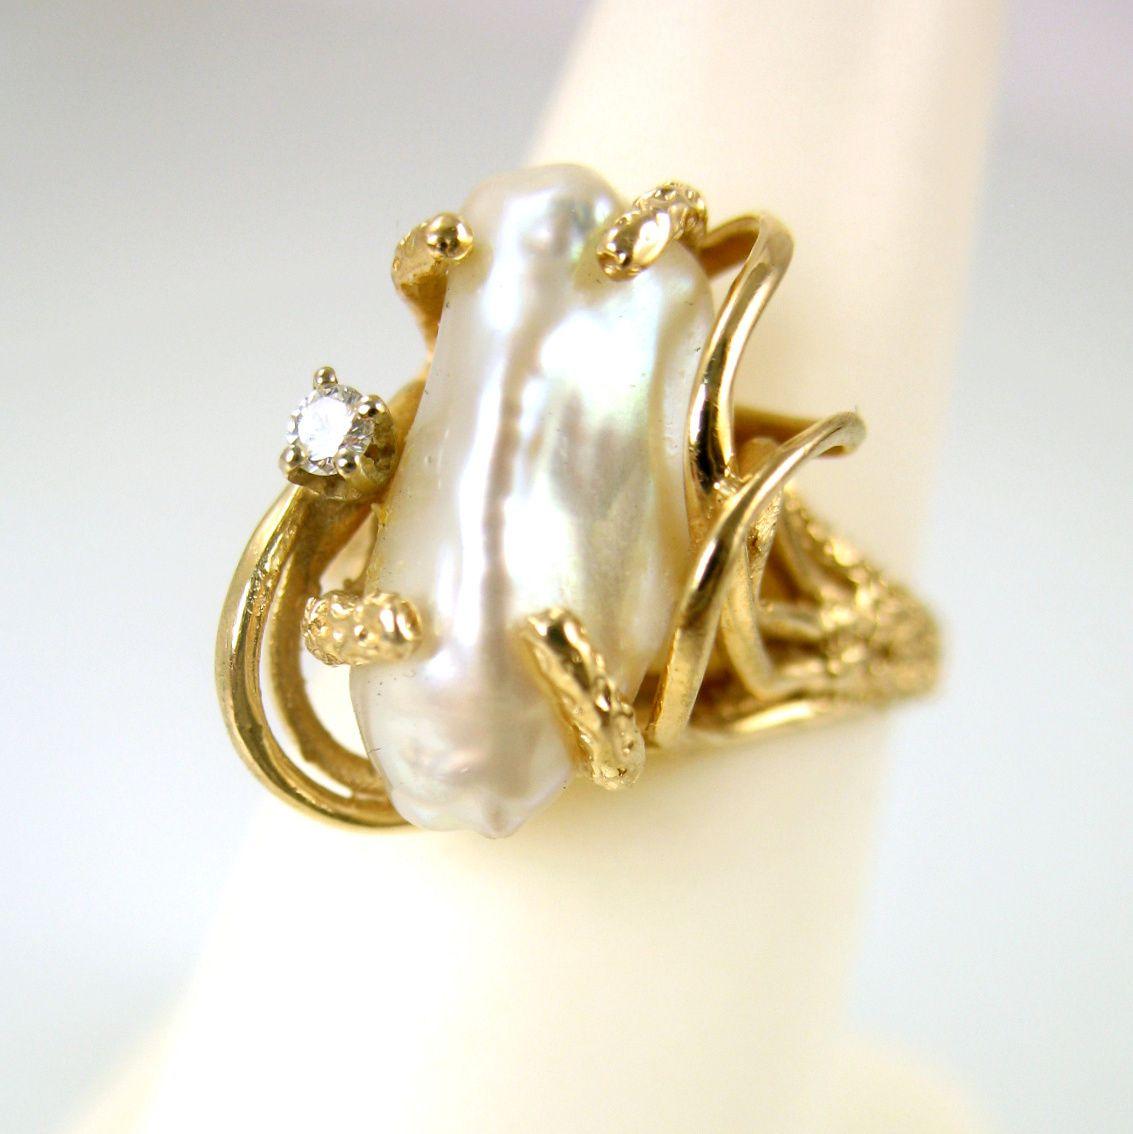 Baroque pearl rings | Modernist 14k Gold Ring Biomorphic Baroque Pearl Diamond